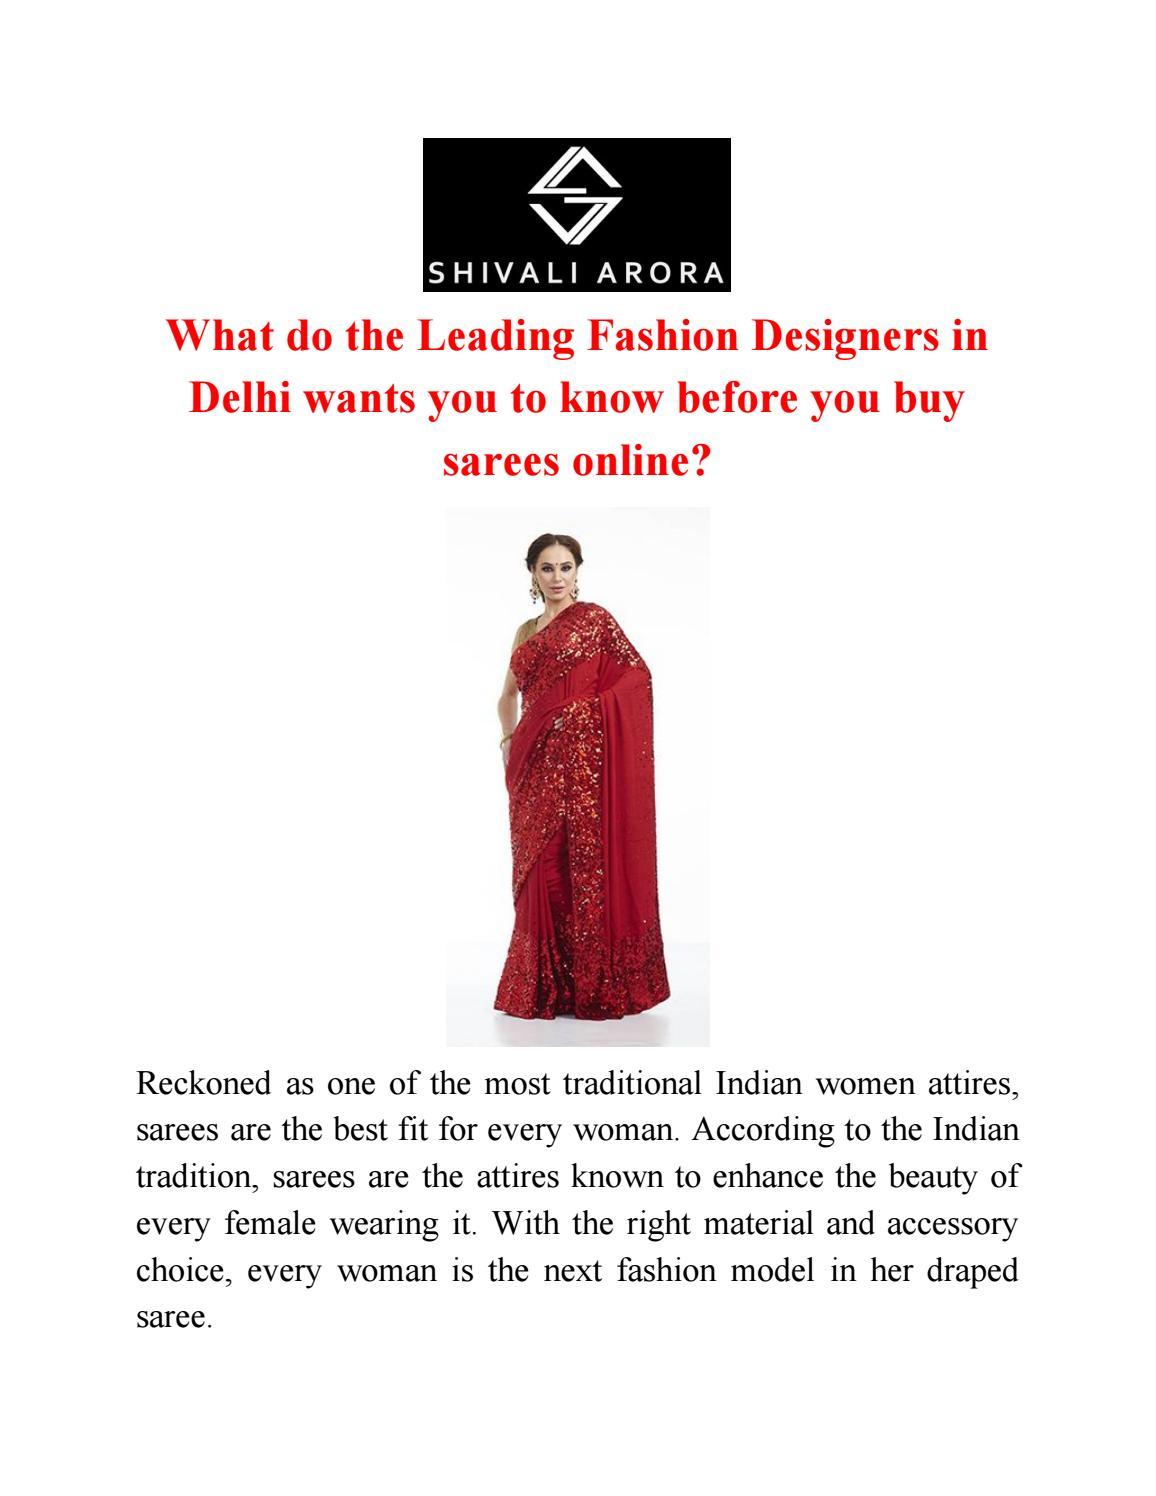 Buy Designer Sarees Online In Delhi Top Fashion Designers In Delhi By Shivali Arora Issuu